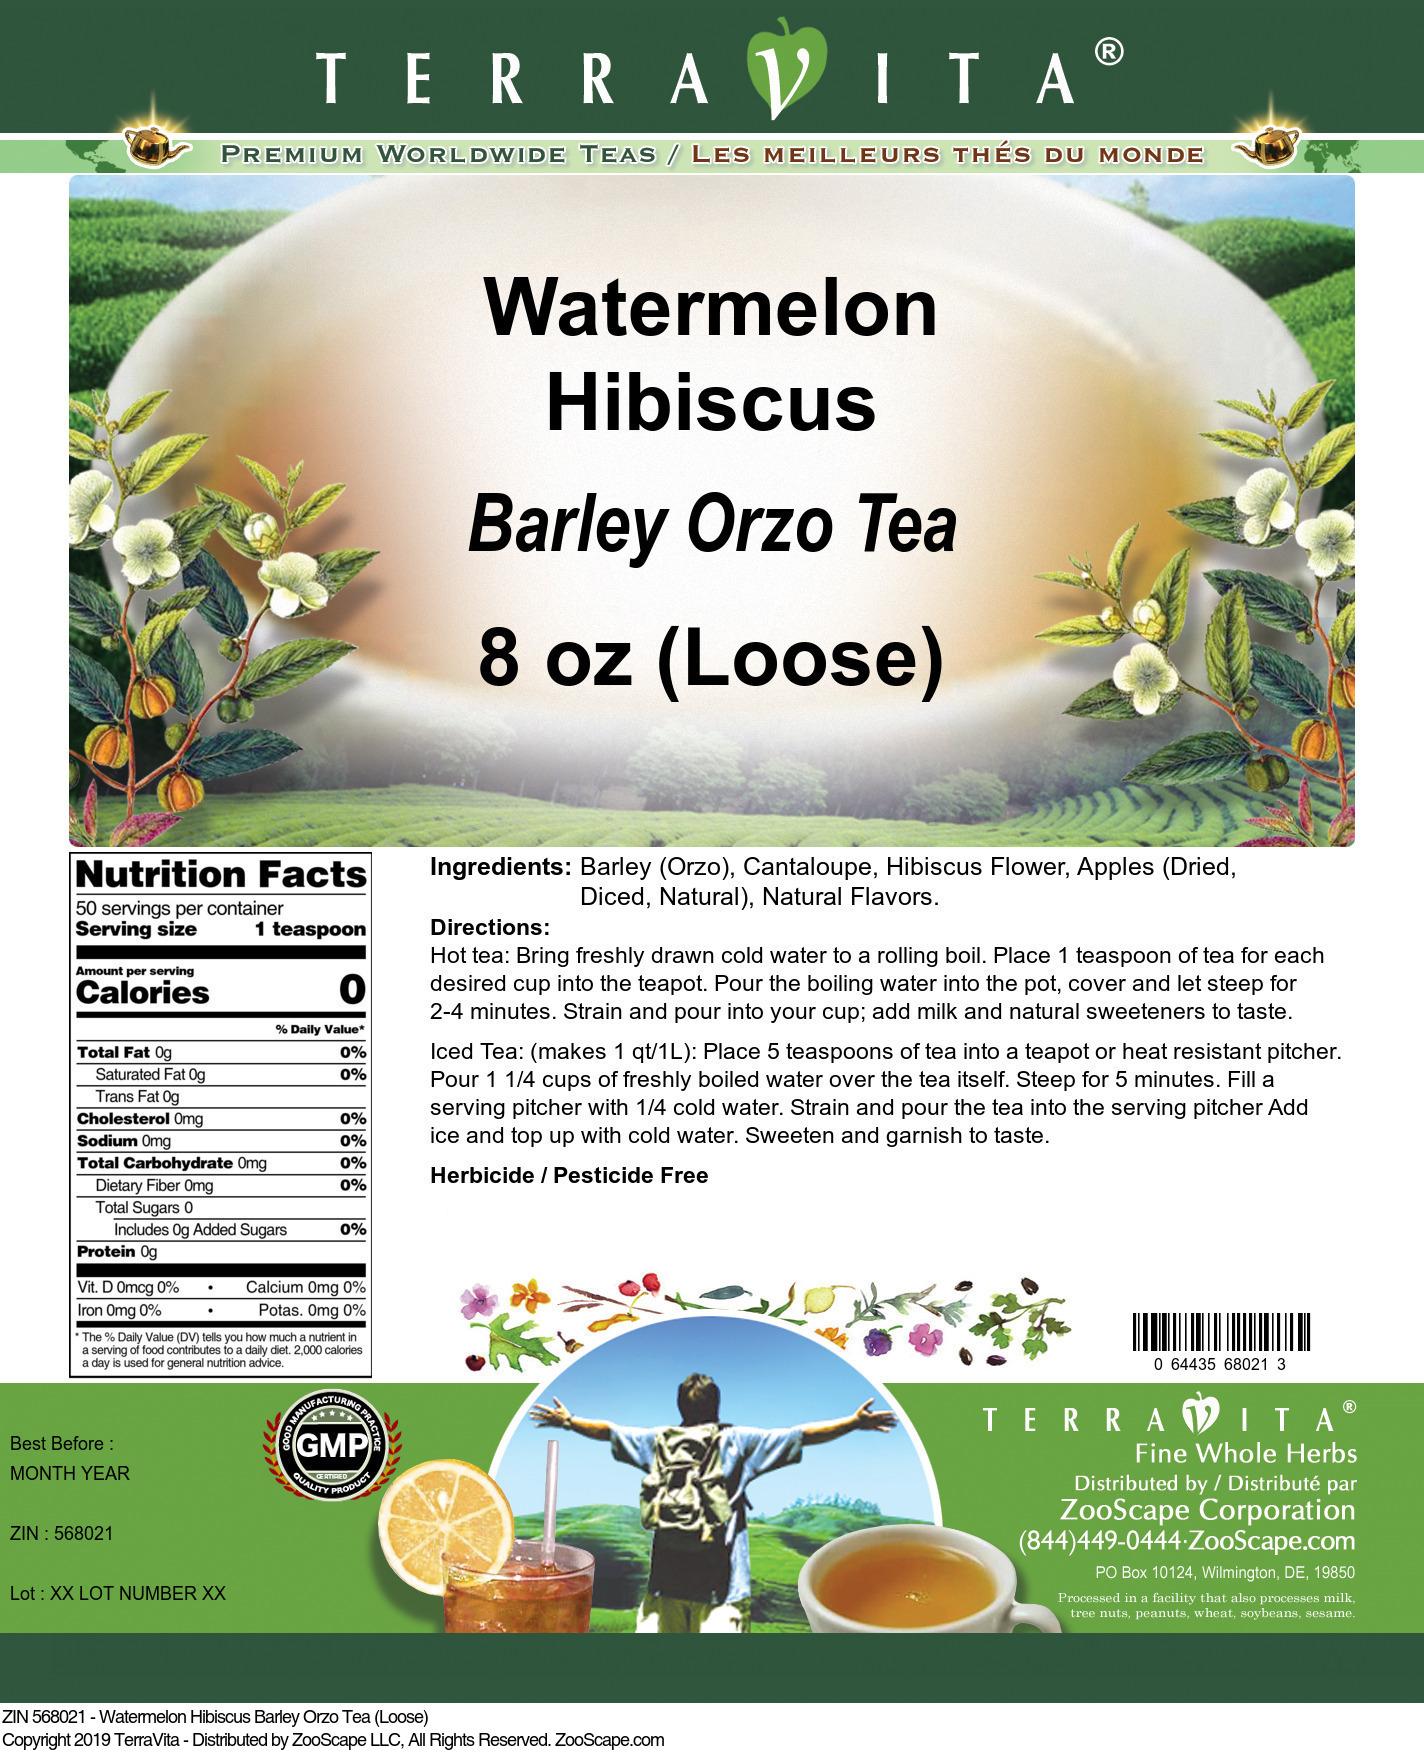 Watermelon Hibiscus Barley Orzo Tea (Loose)